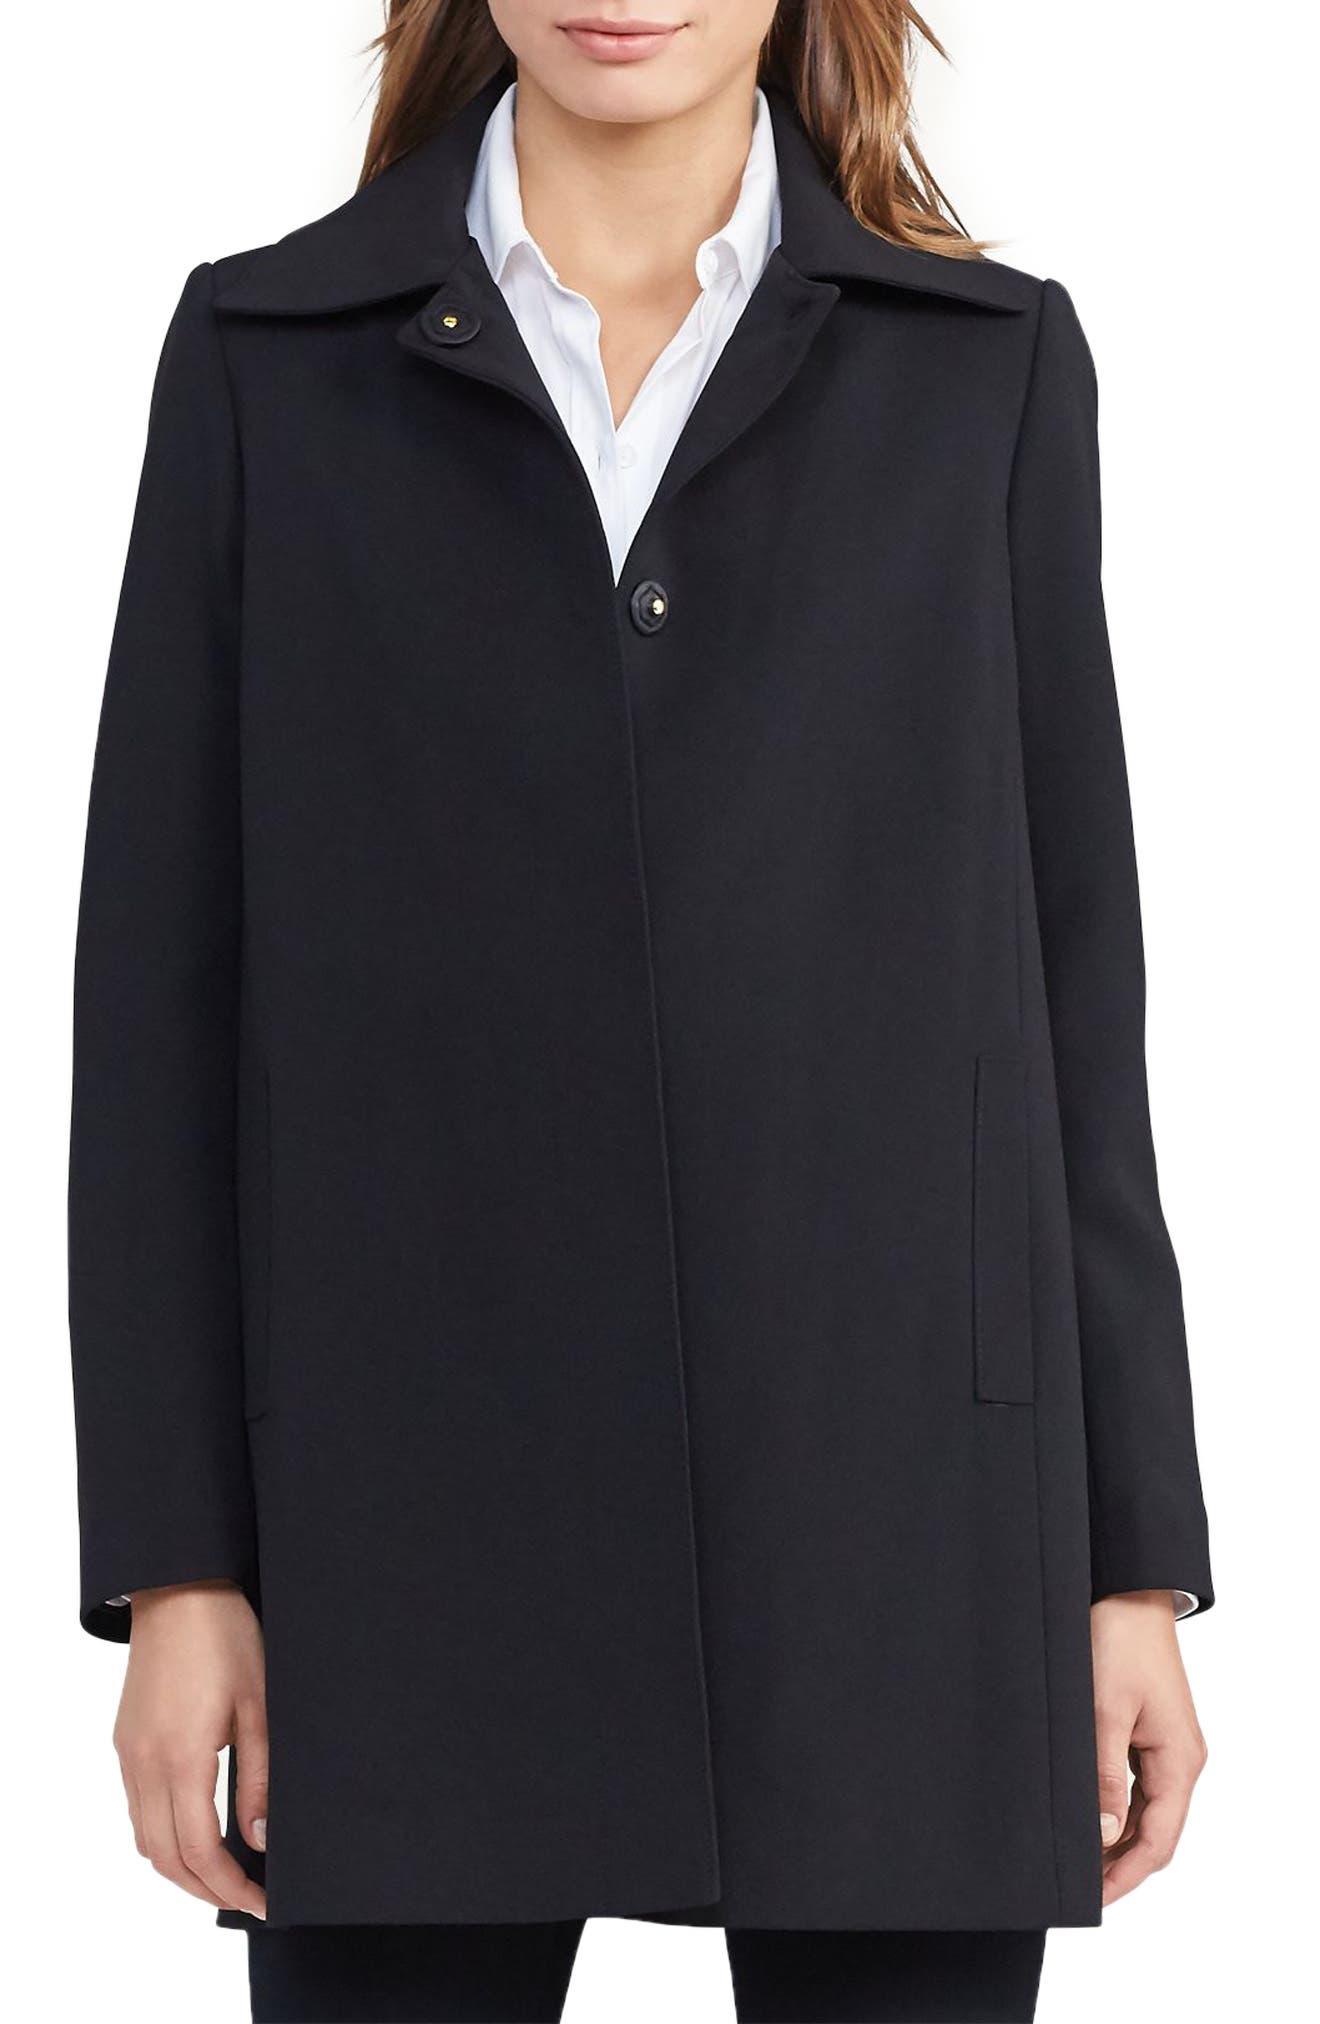 Crepe Jacket,                             Main thumbnail 1, color,                             Black